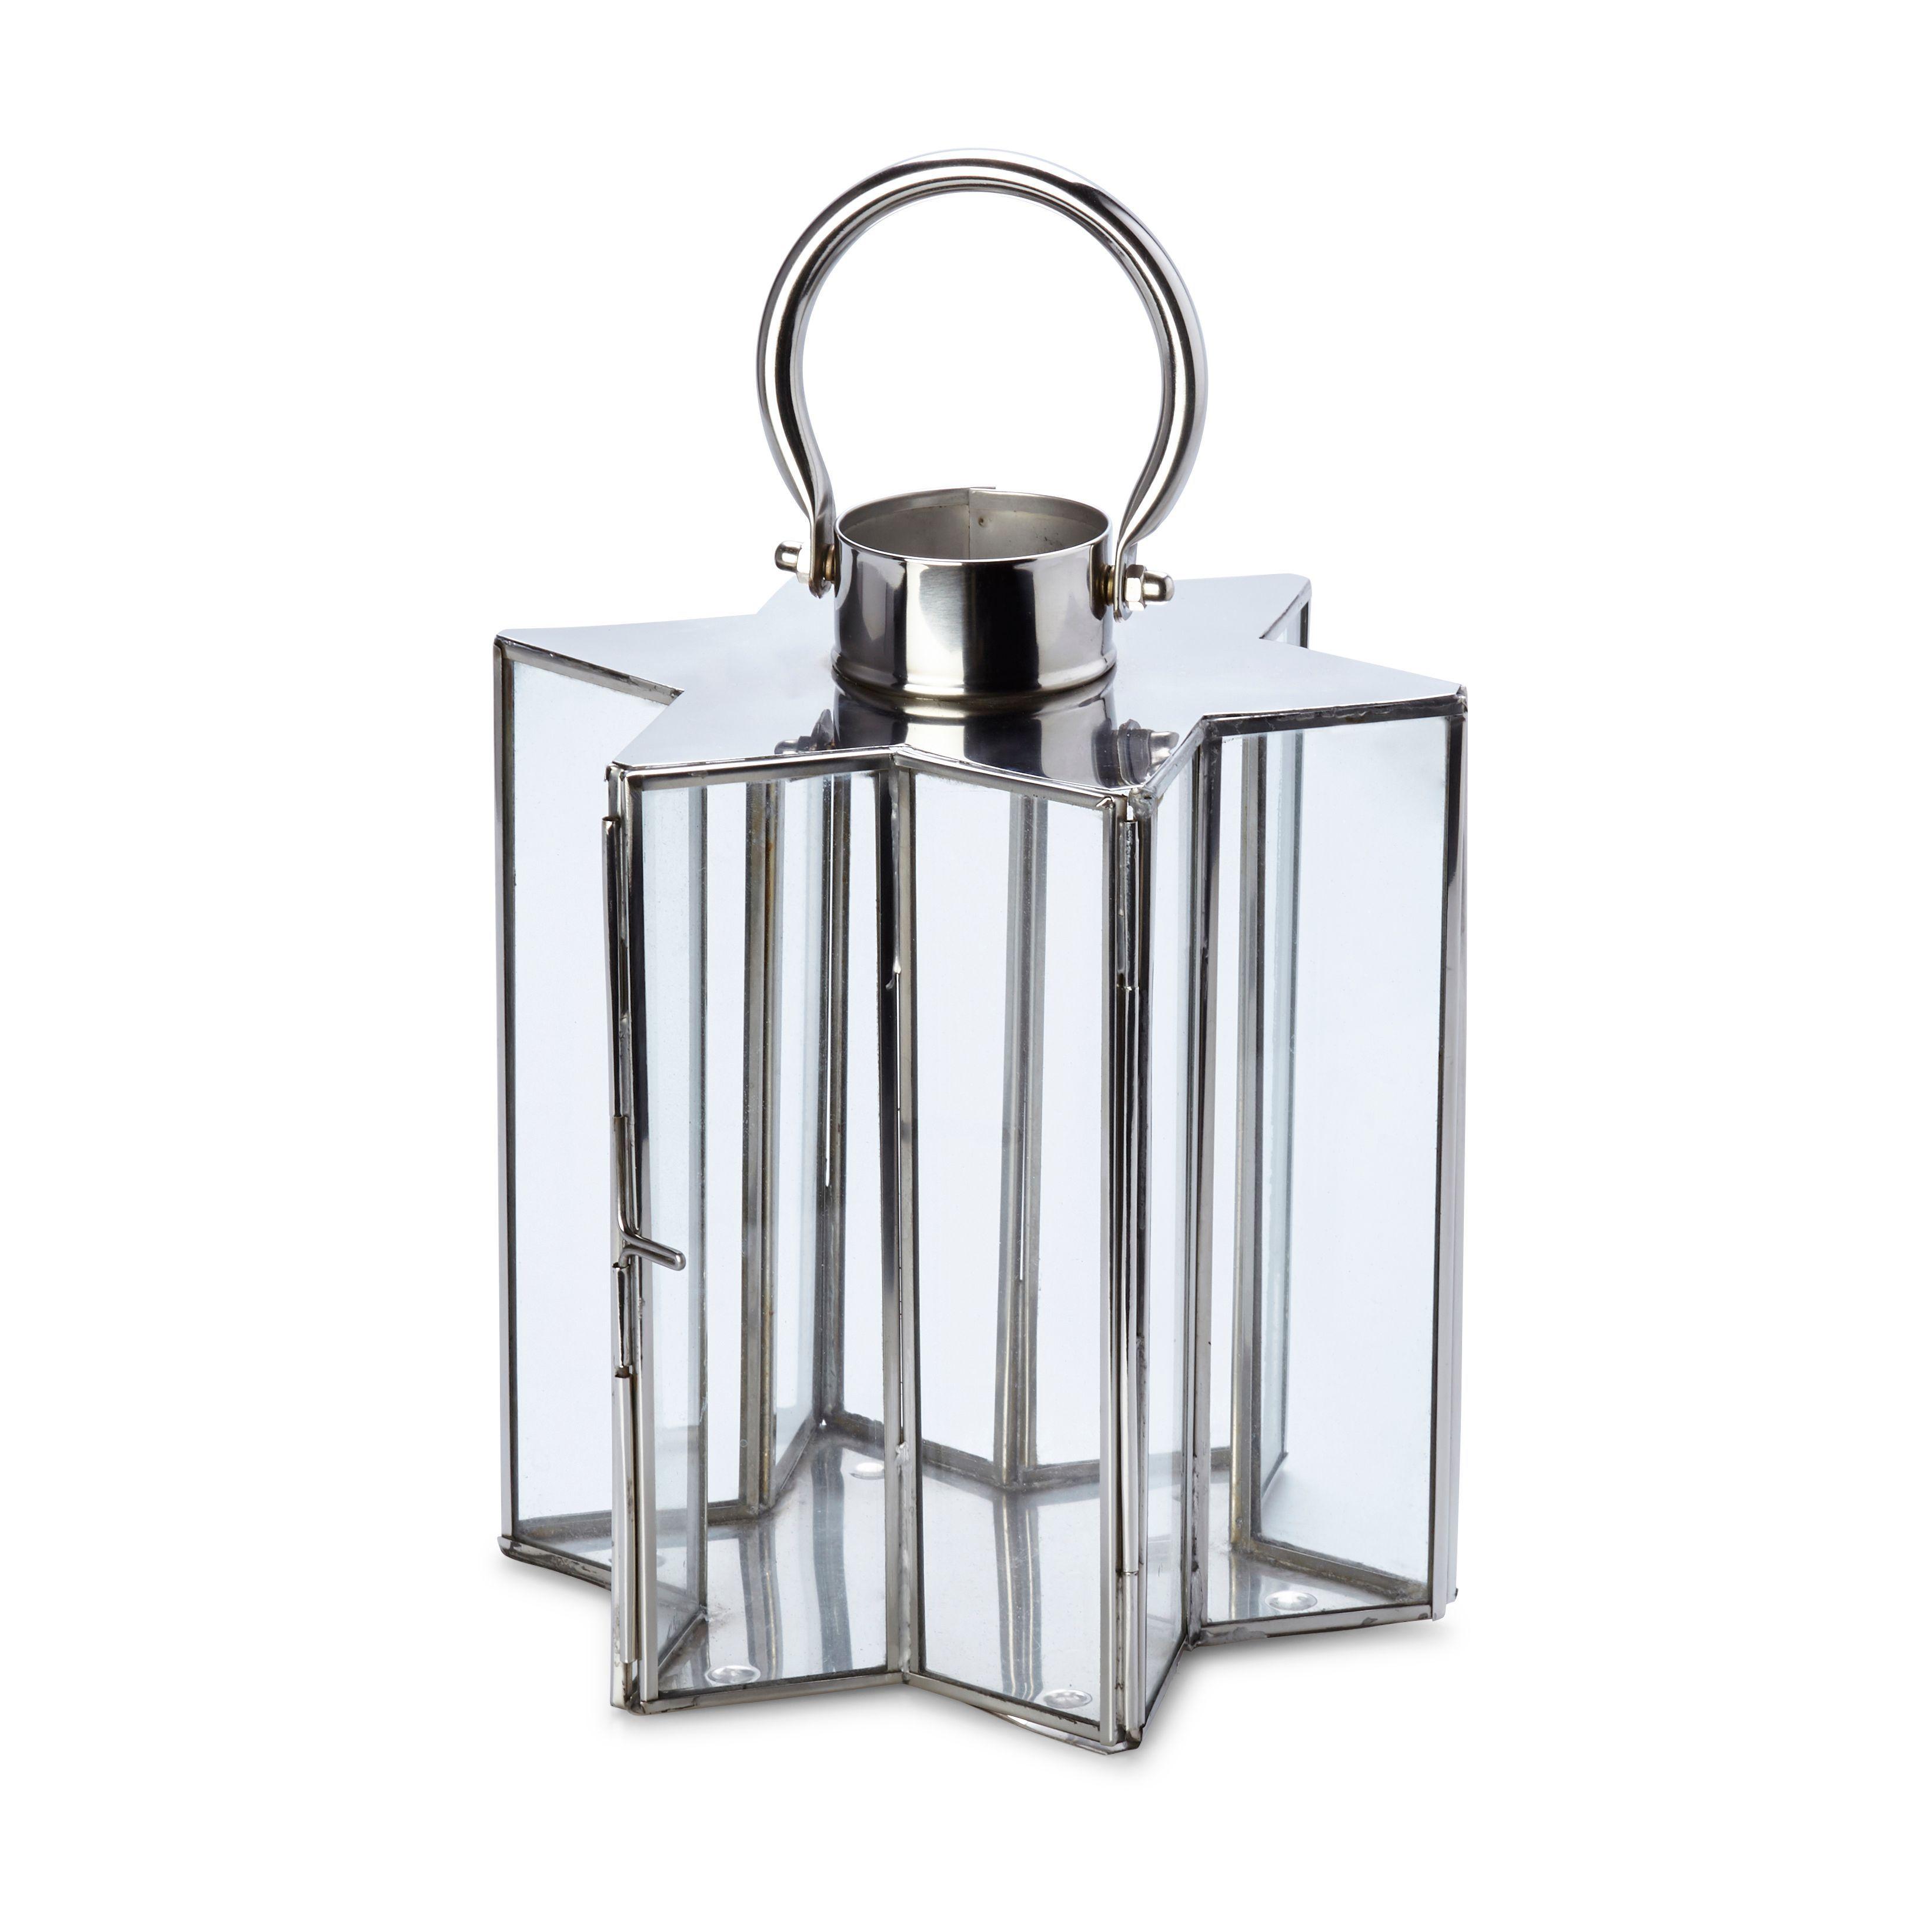 Star Glass & Stainless Steel Lantern